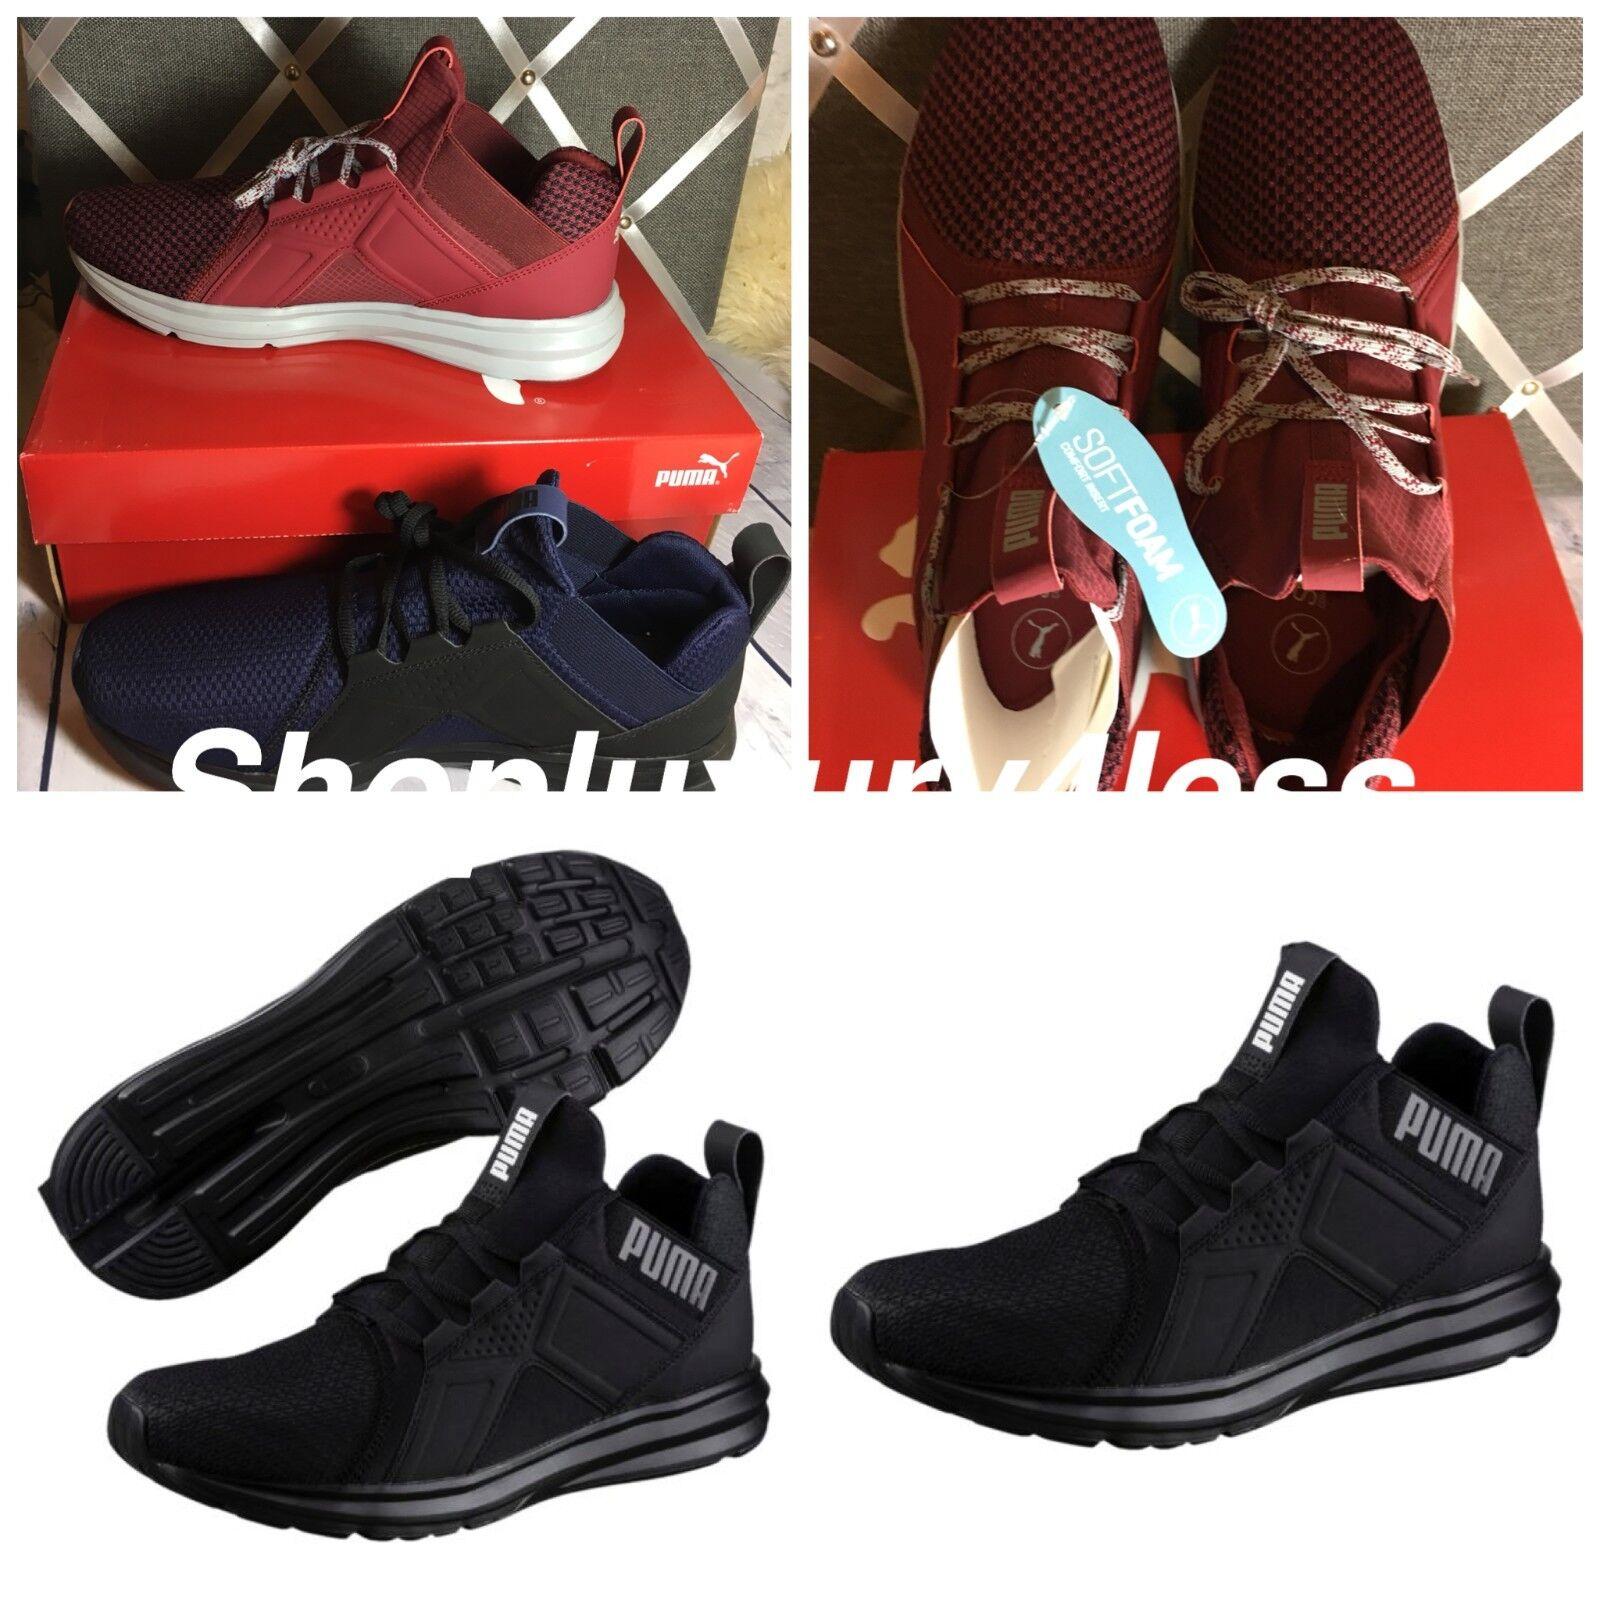 outlet store bb69c ff081 New Puma Enzo Enzo Enzo Terrain tejida de capacitación de hombres zapatos  zapatillas todas 3 colores. Nike Air Force 1 ...